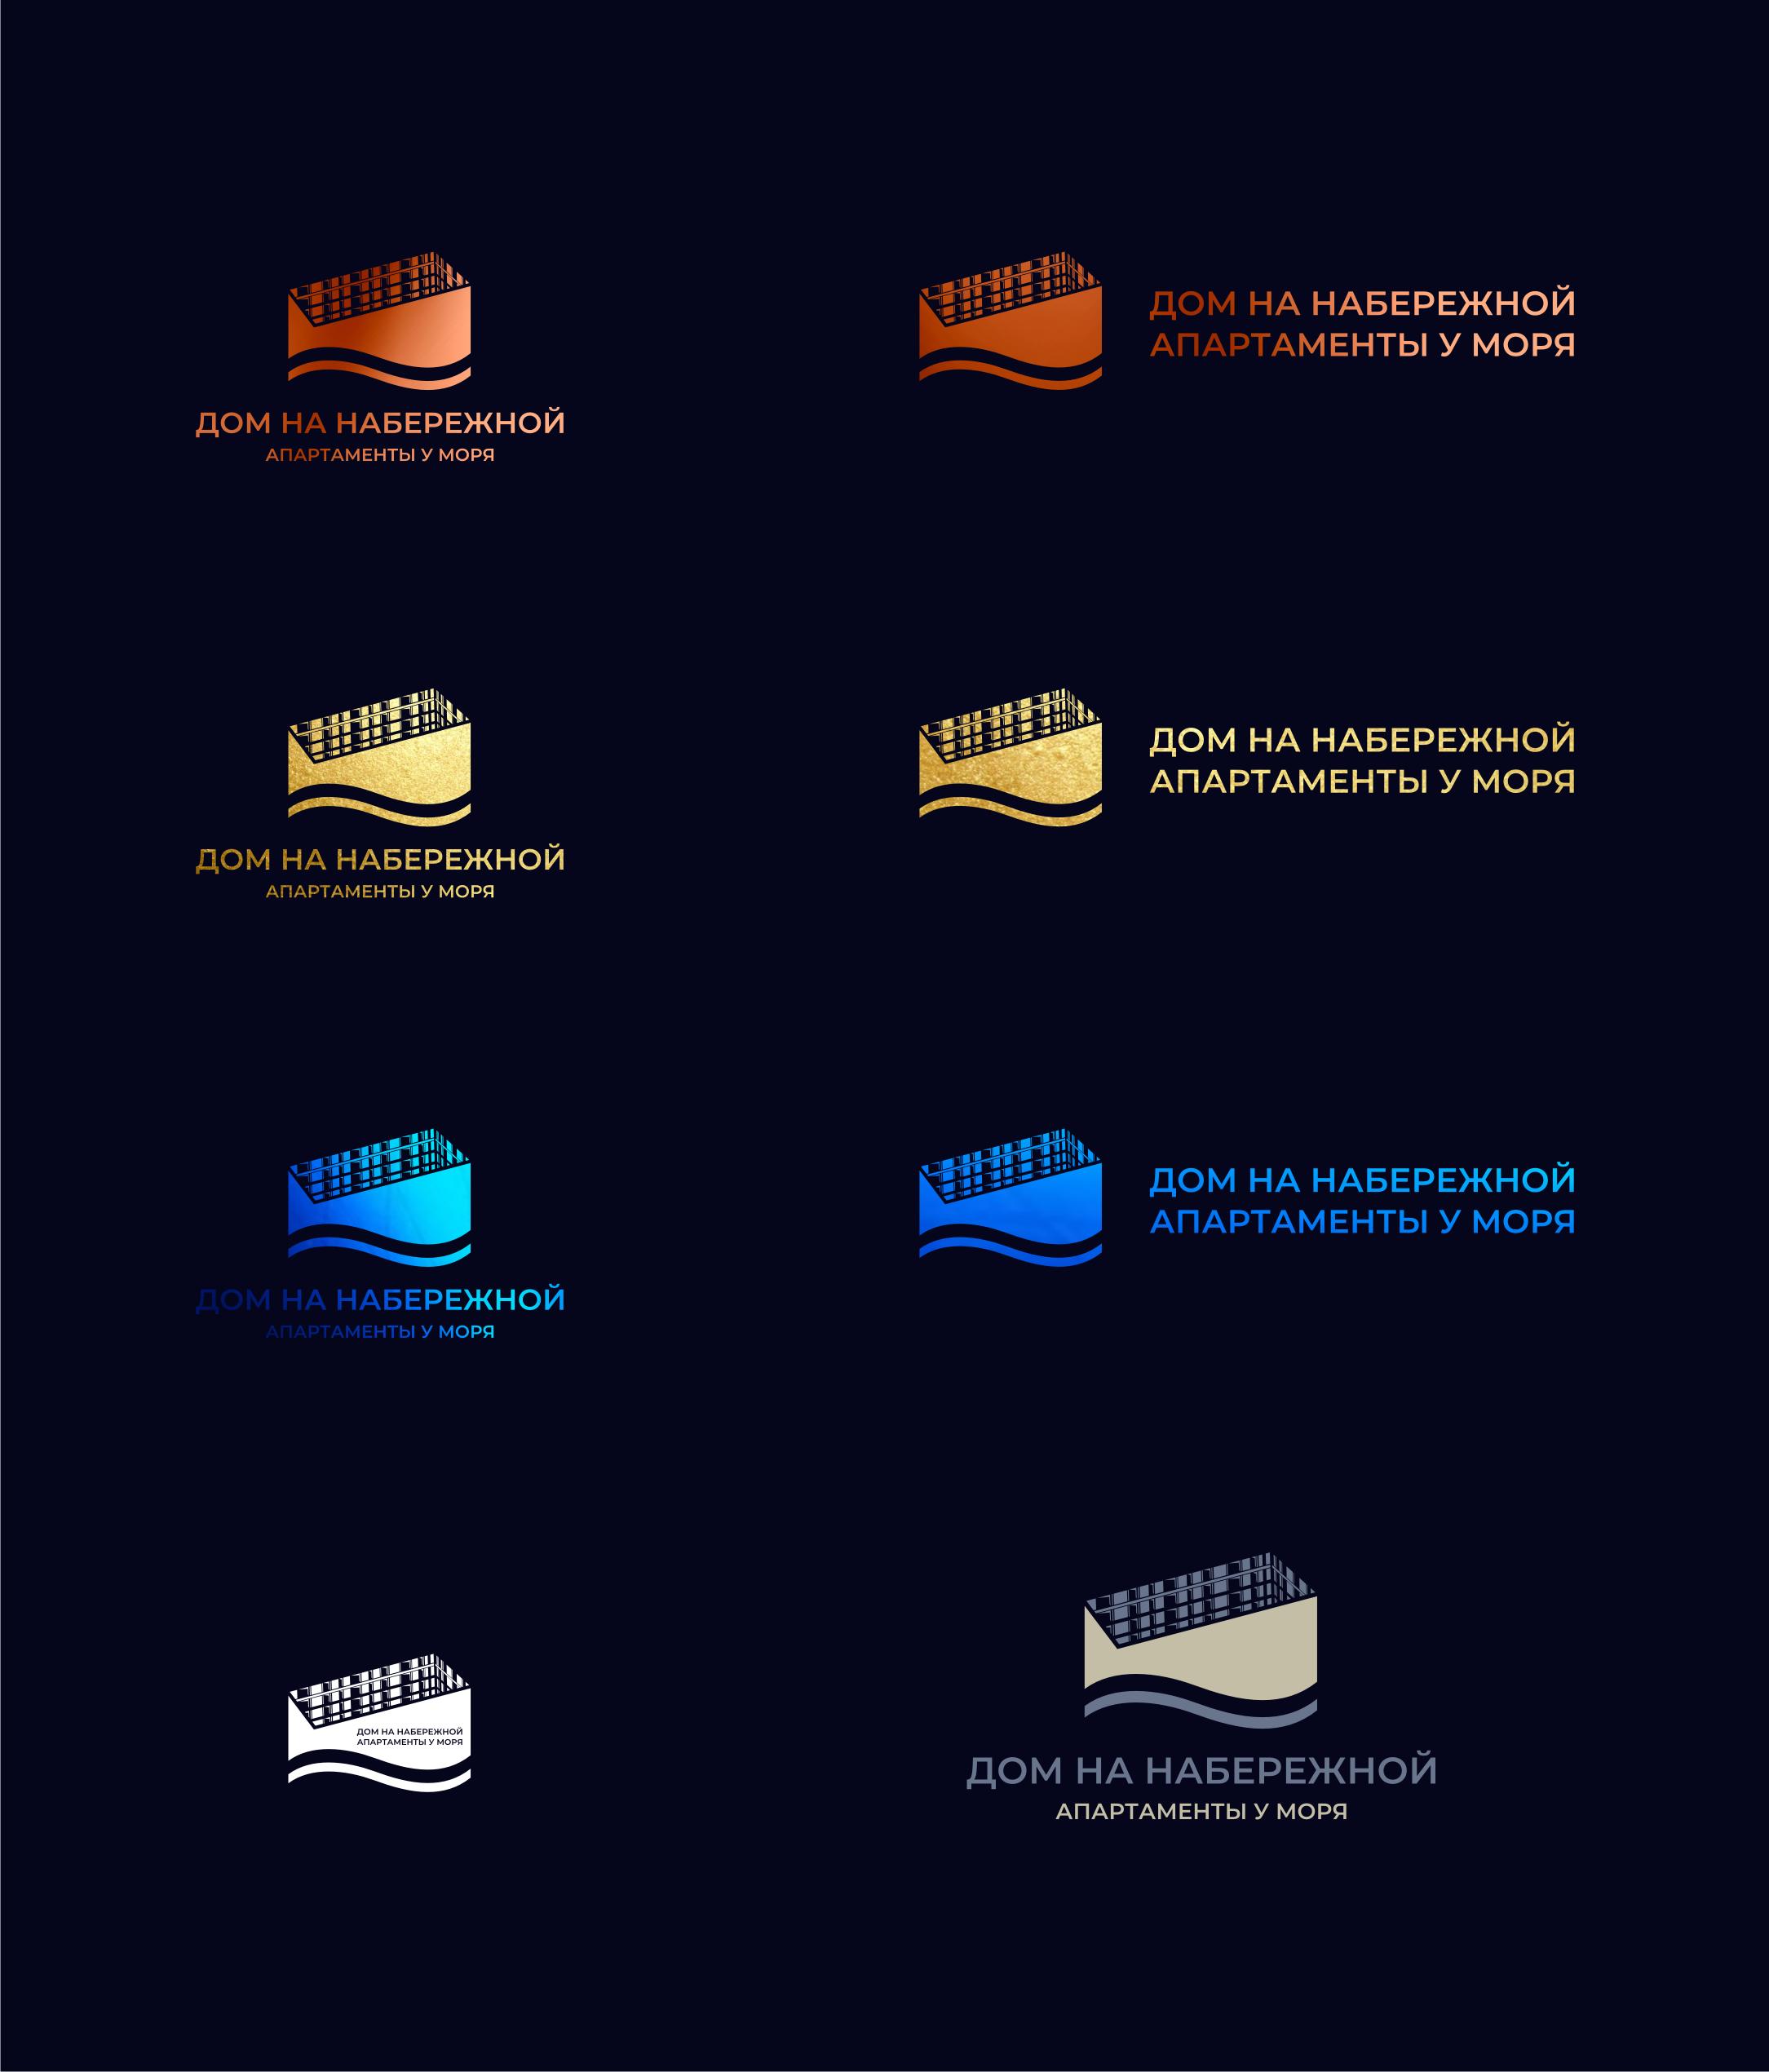 РАЗРАБОТКА логотипа для ЖИЛОГО КОМПЛЕКСА премиум В АНАПЕ.  фото f_0165de9111b6d532.png